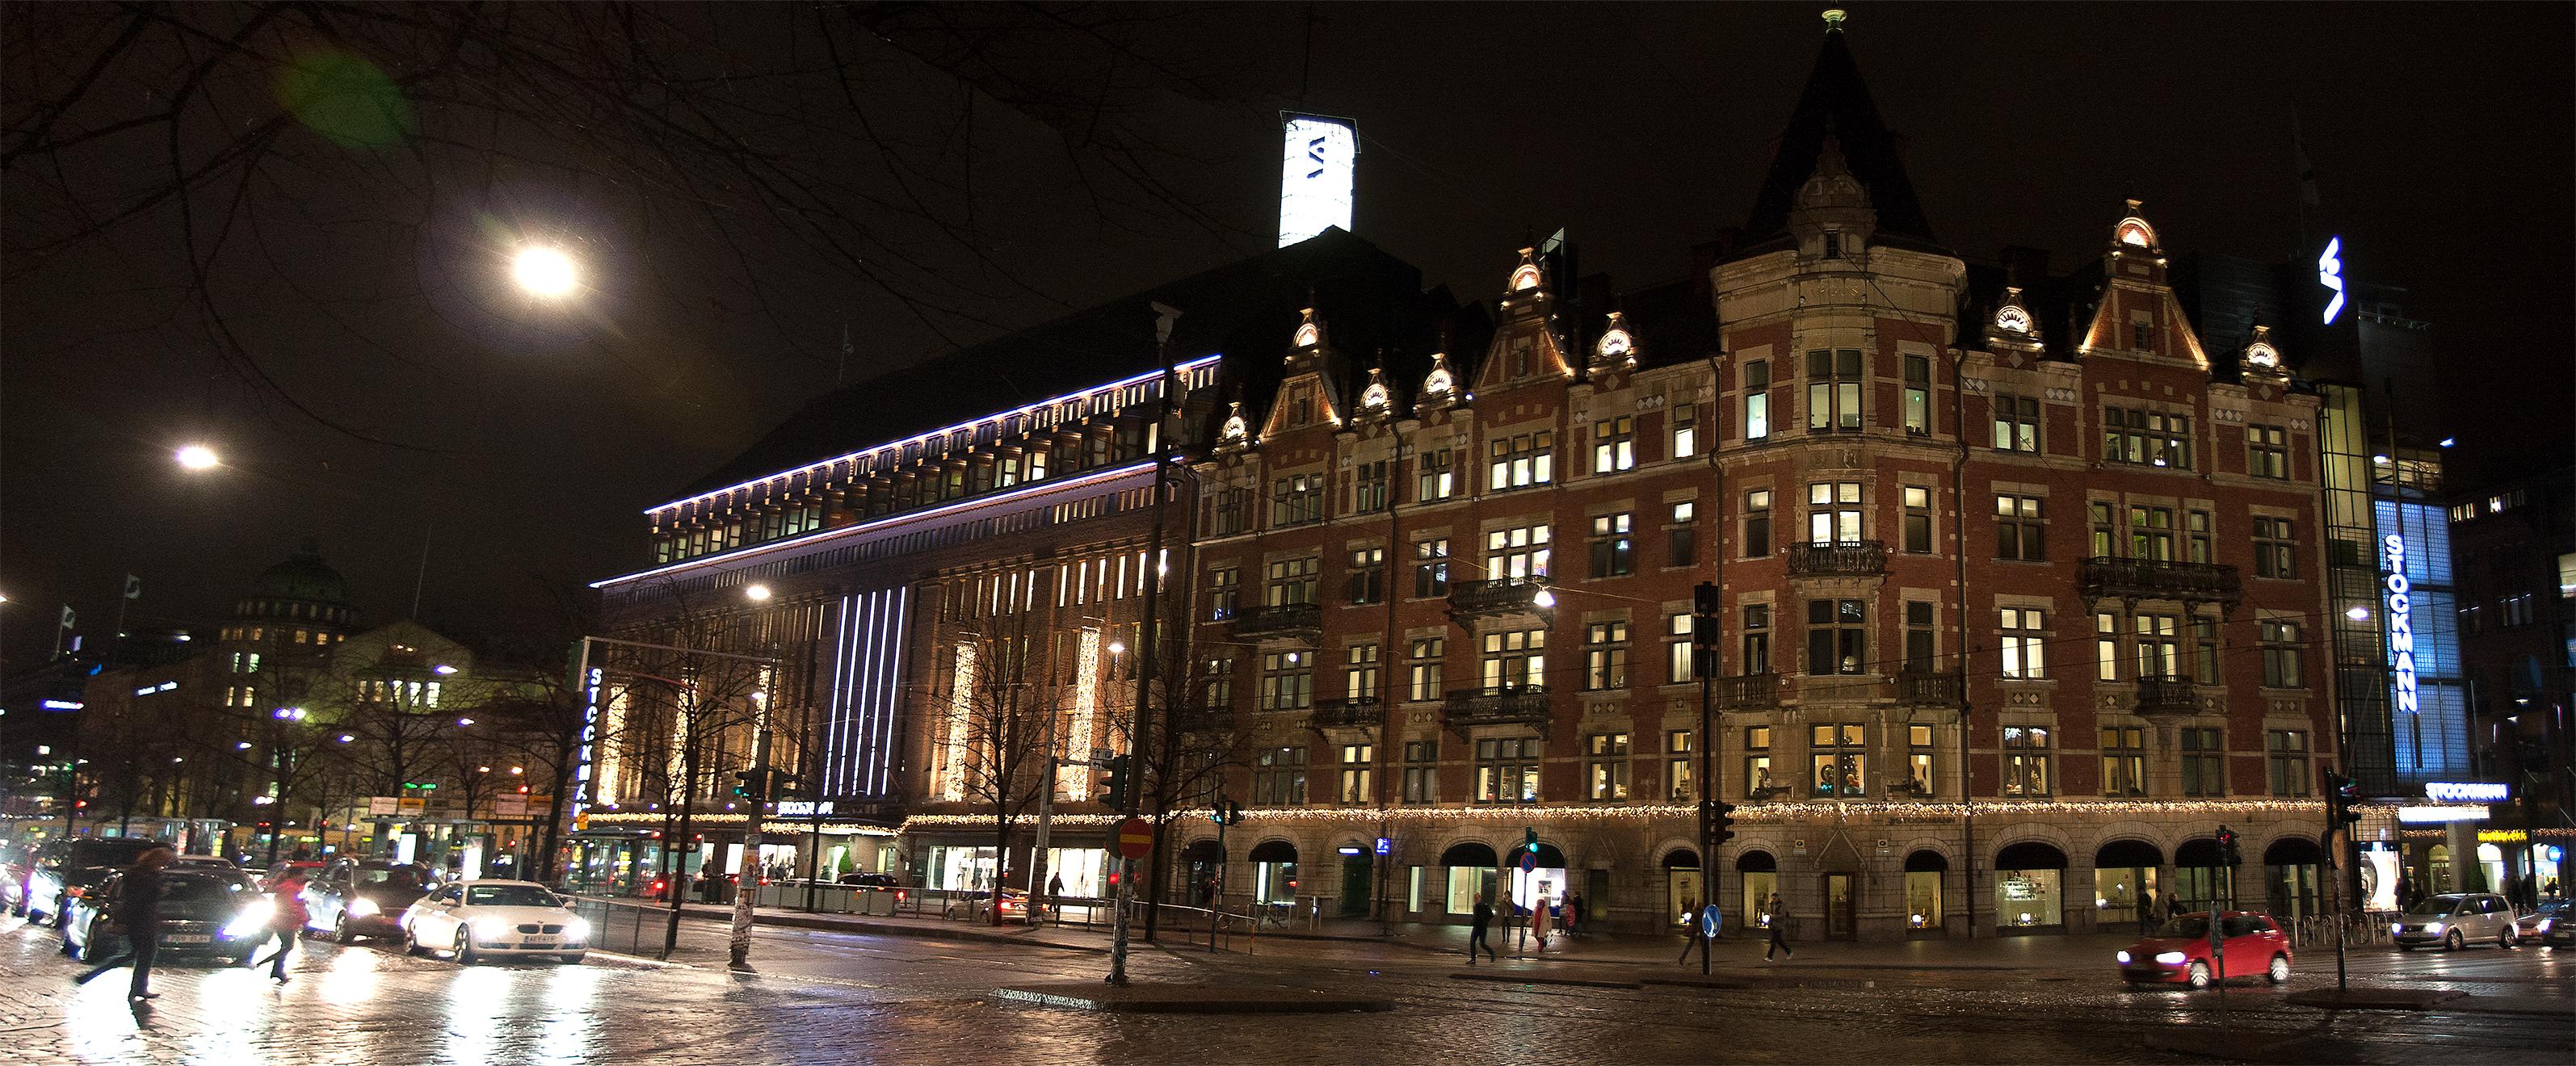 Helsinki during the night